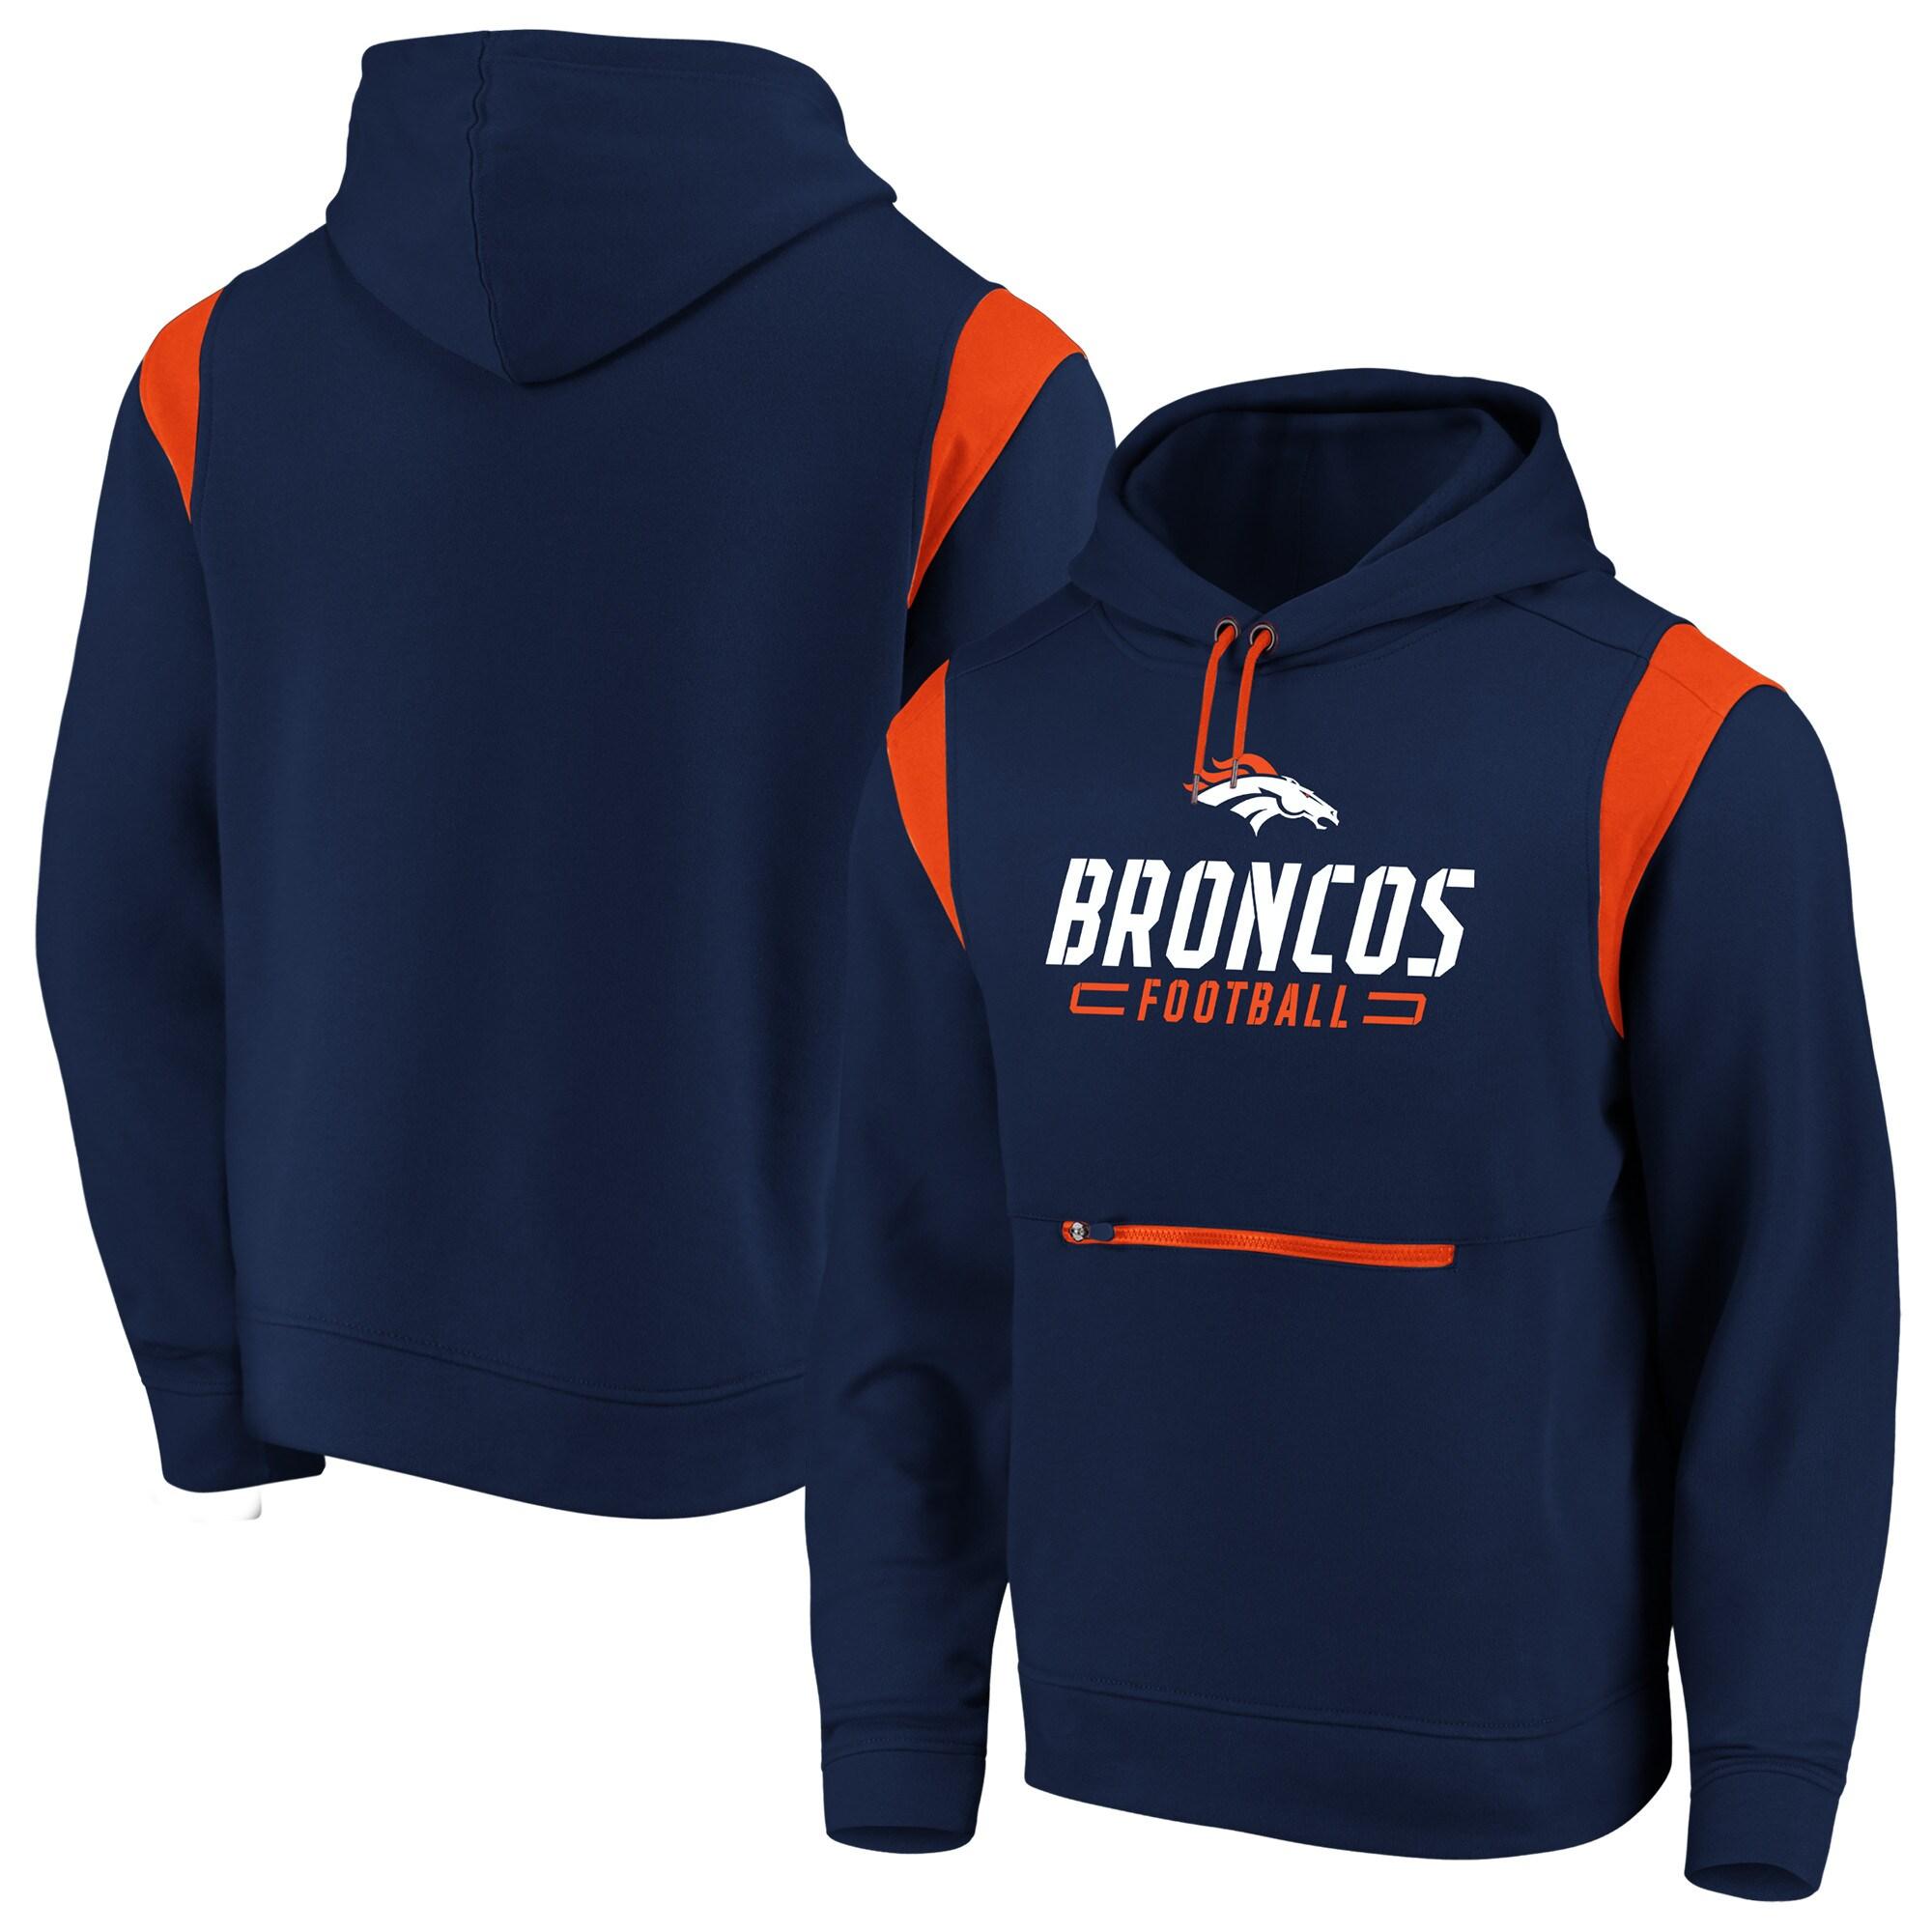 Denver Broncos NFL Pro Line by Fanatics Branded Iconic Overdrive Pullover Hoodie - Navy/Orange